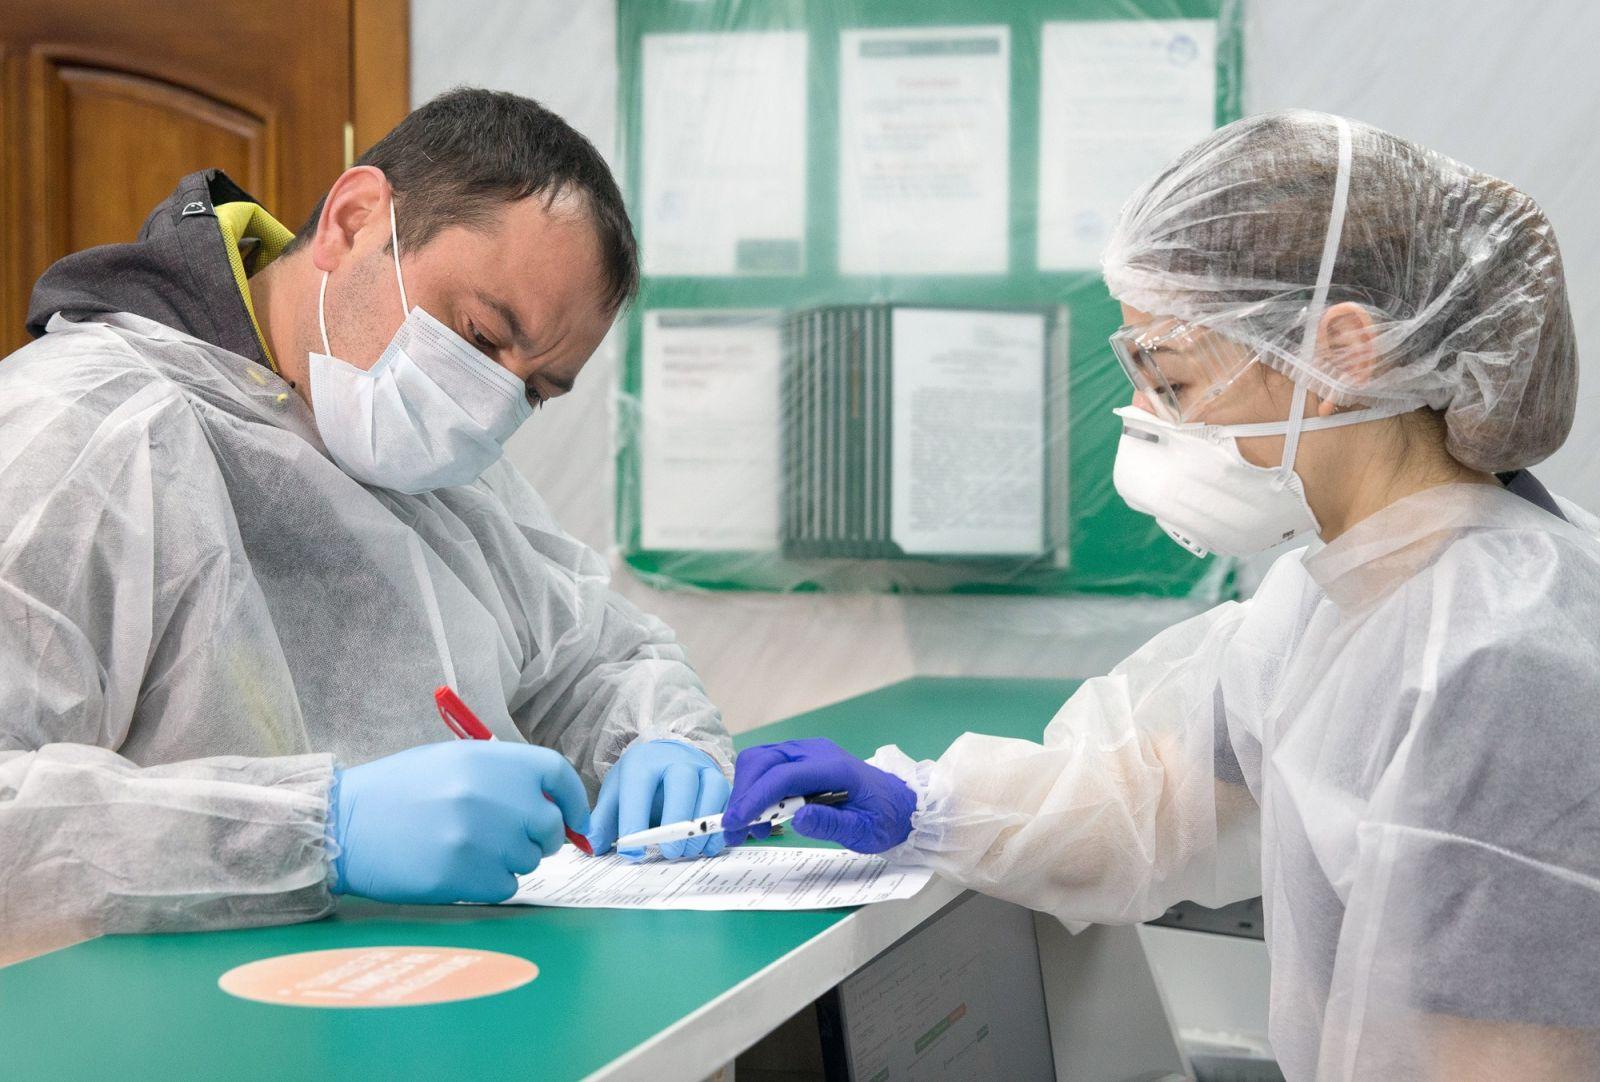 За добу на Київщині виявили 16 нових хворих на COVID-19 -  - koronavirus test ukraina